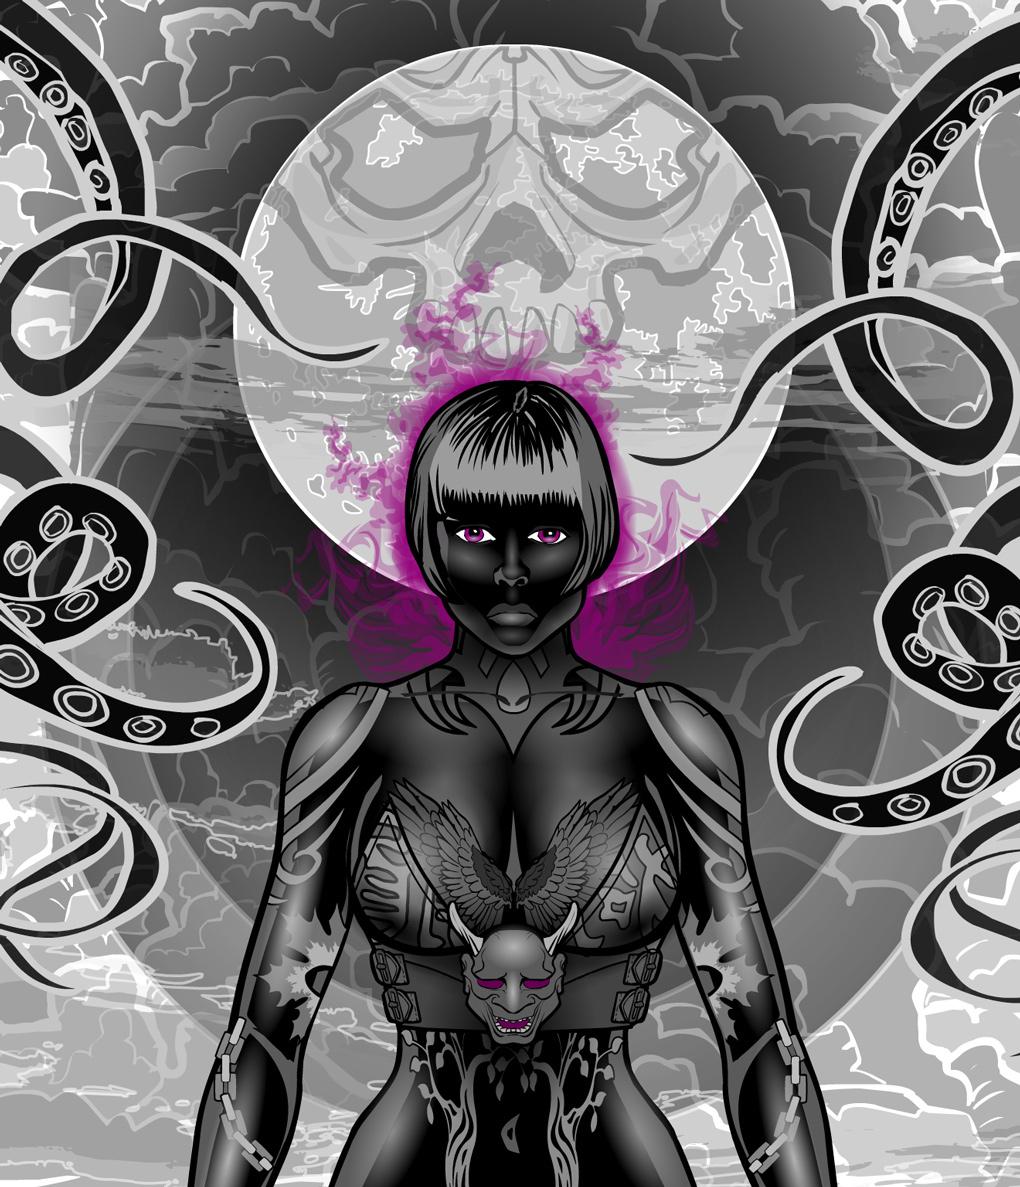 http://www.heromachine.com/wp-content/legacy/forum-image-uploads/dblade/2012/05/dblade_midnightseer_black.jpg